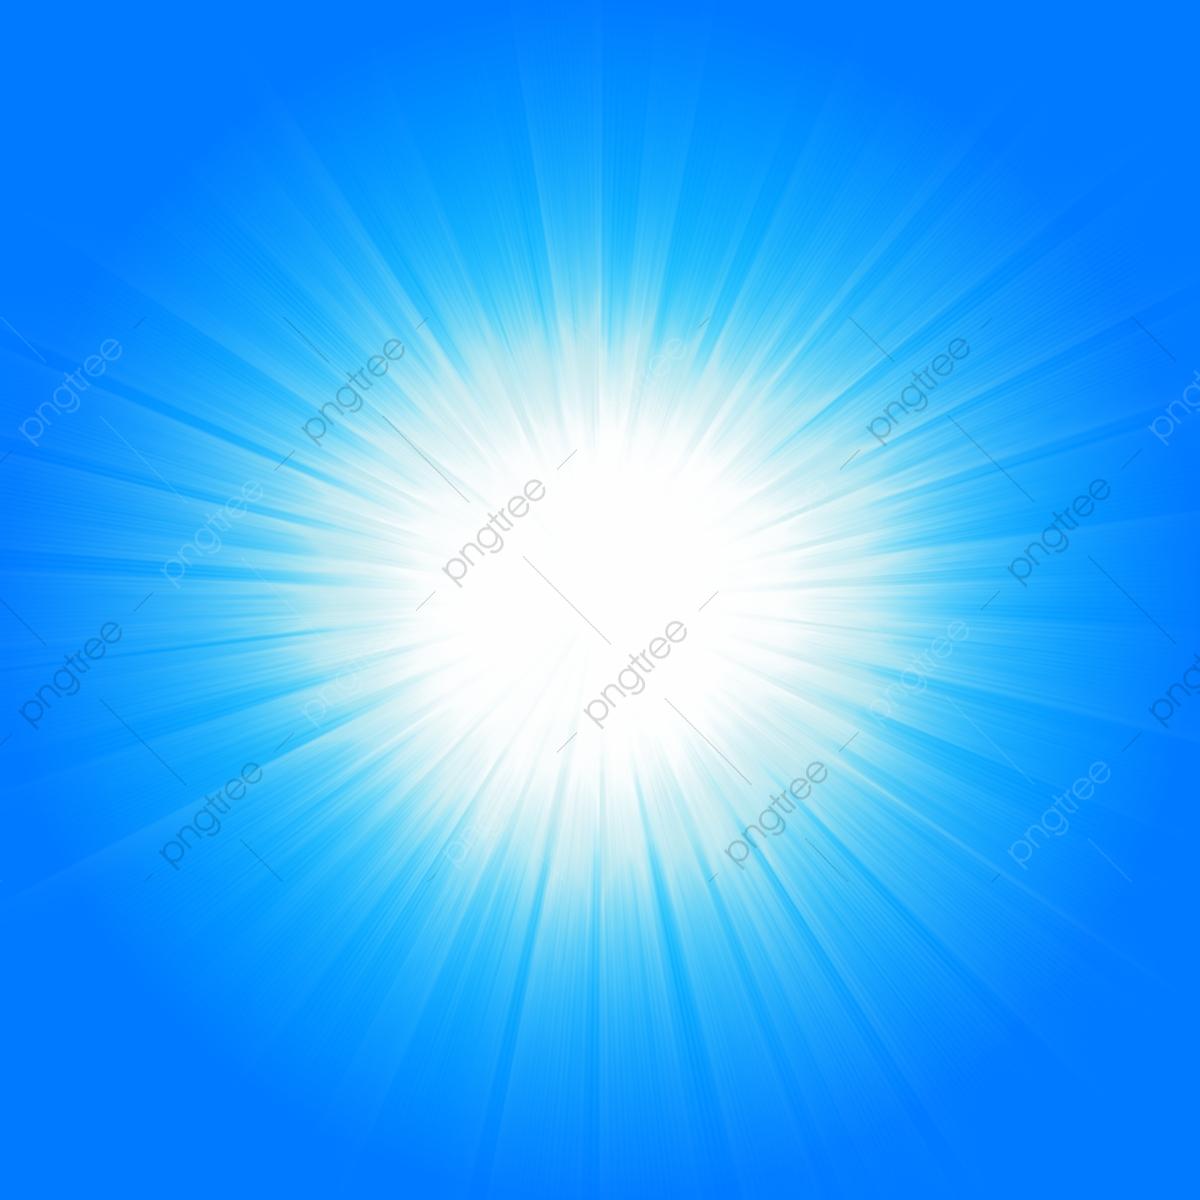 Blue Sun Light Burst, Blue, White, Sun PNG Transparent Image.